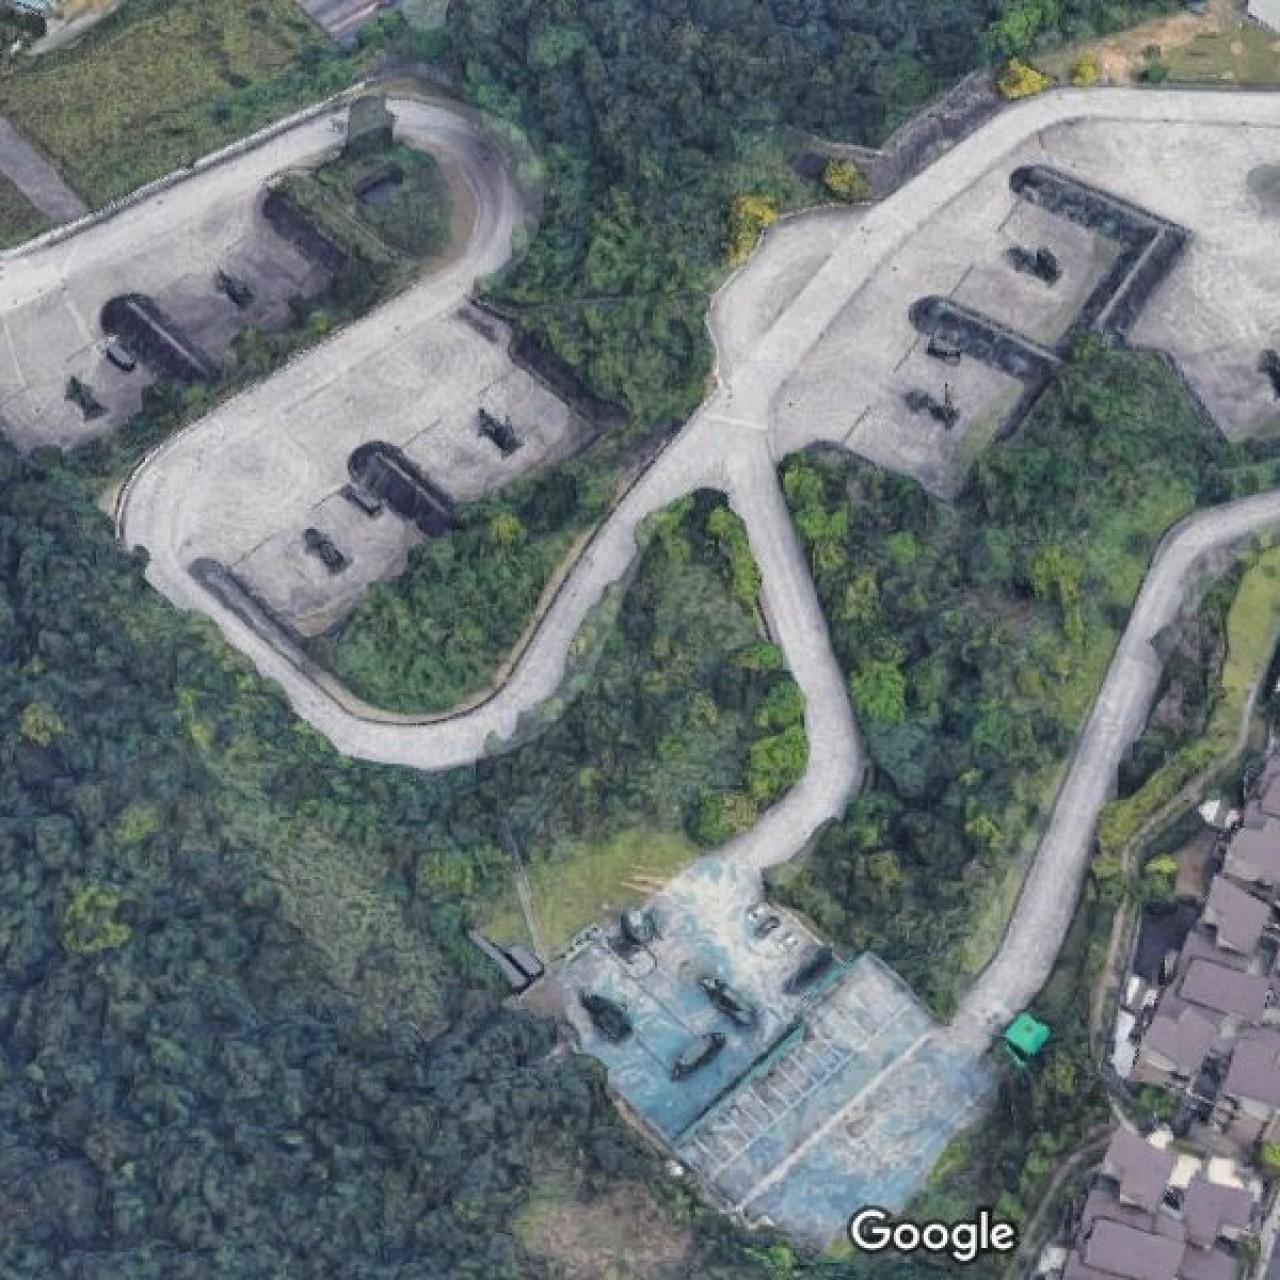 Taiwan's darkest military secrets revealed by Google Maps   South